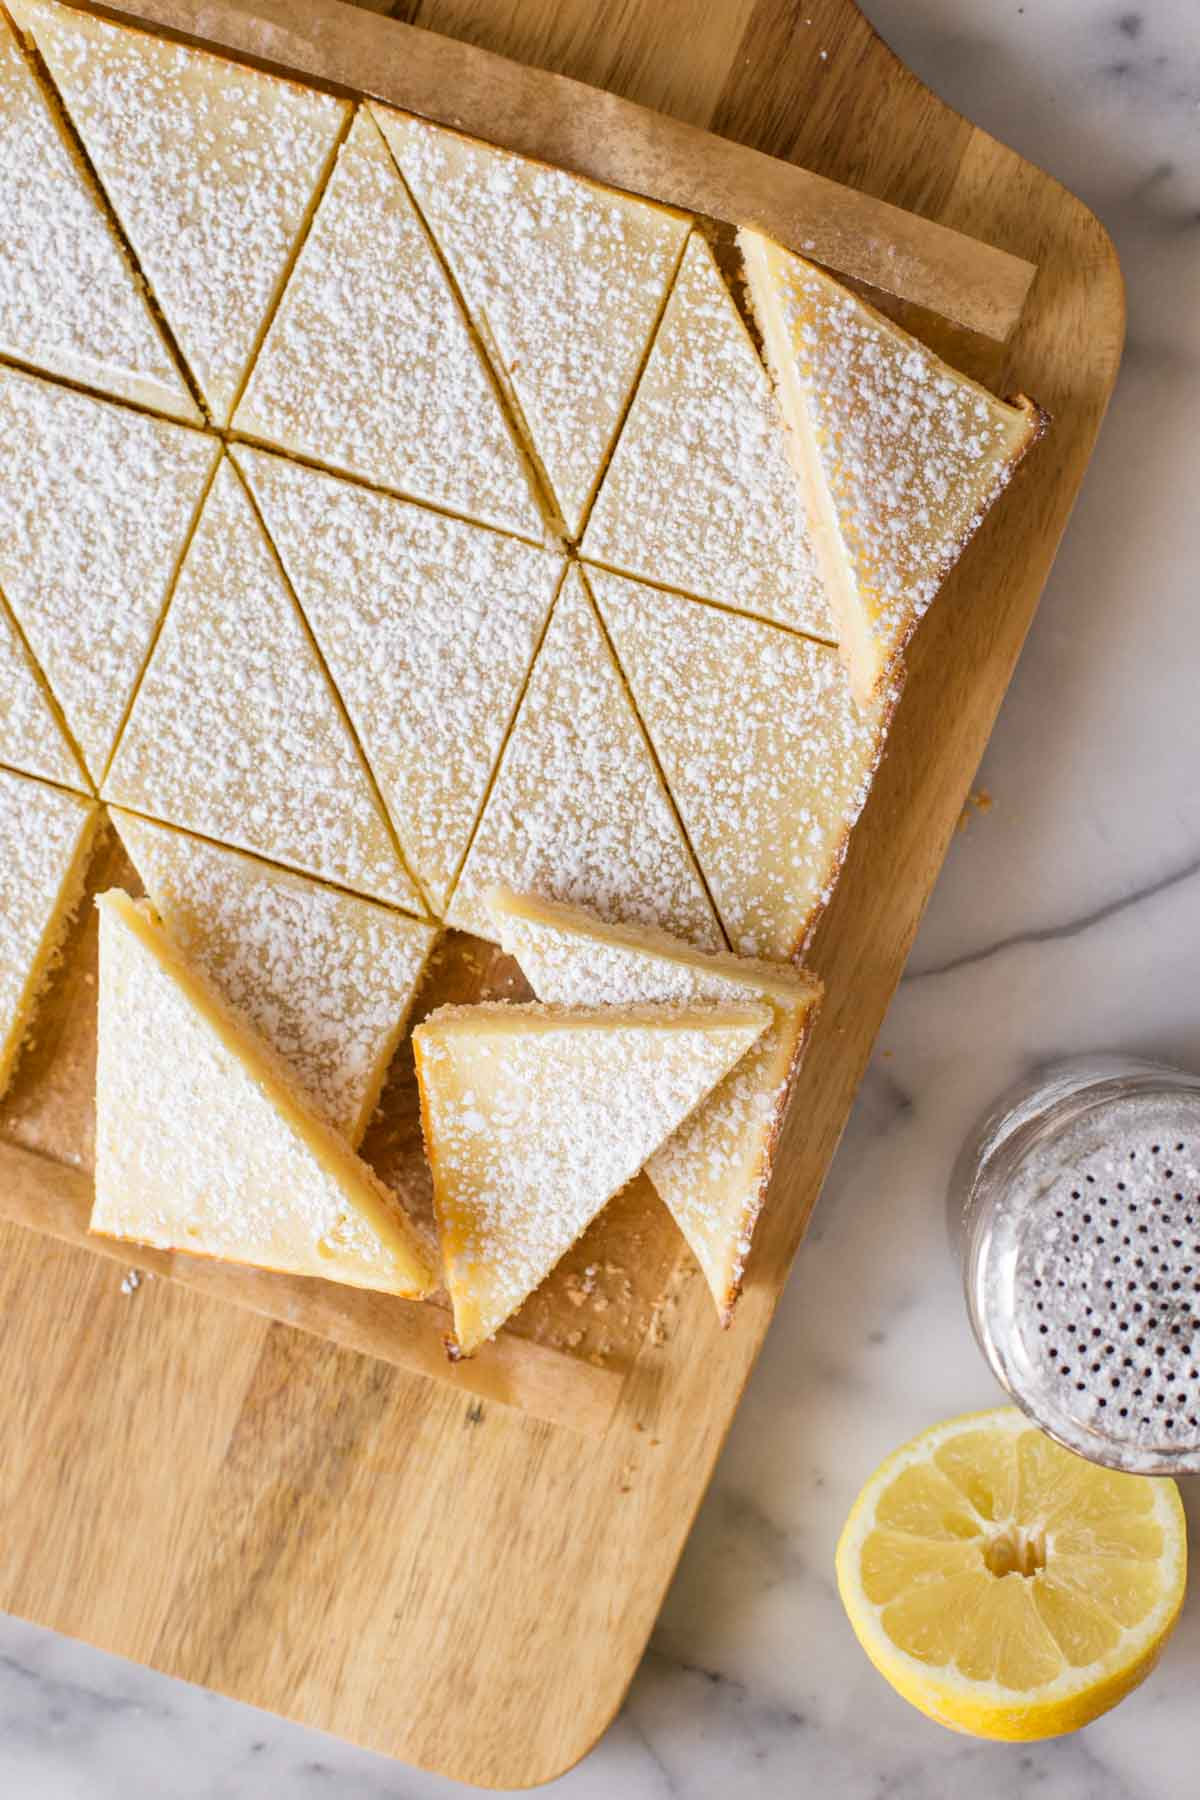 Overhead shot of cut Swedish Lemon Bars on a wooden cutting board.